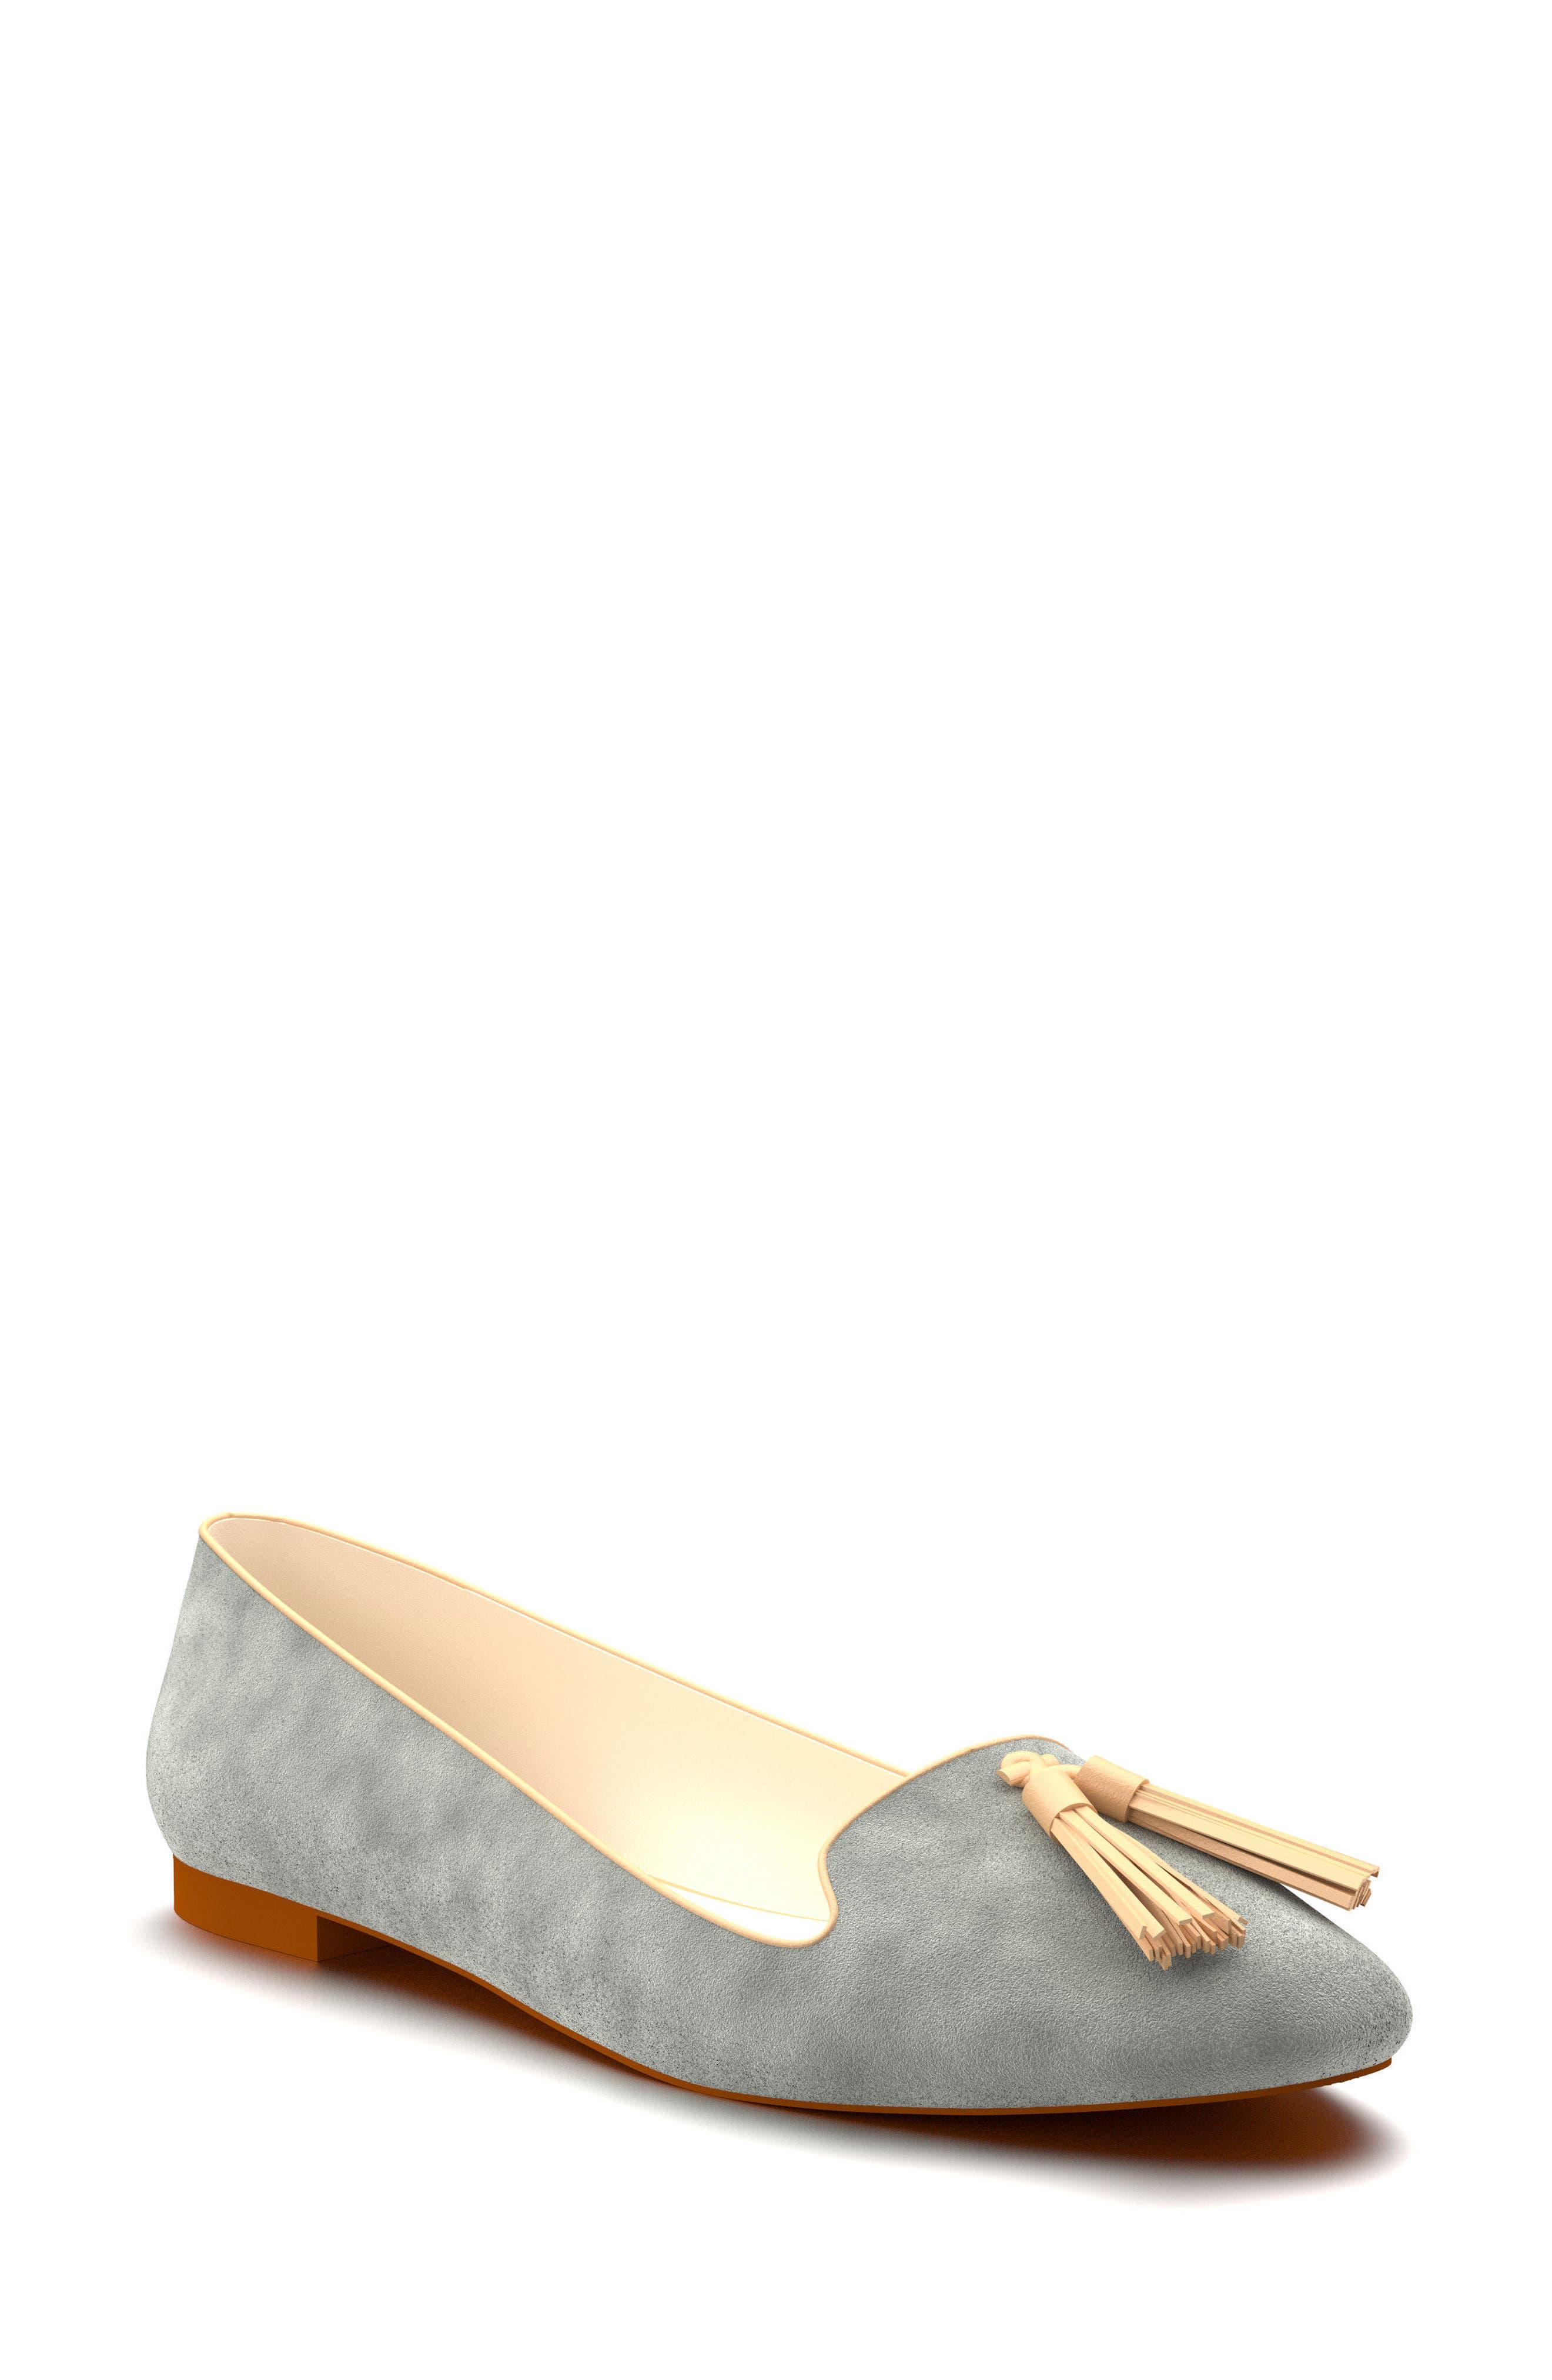 Alternate Image 1 Selected - Shoes of Prey Smoking Slipper (Women)